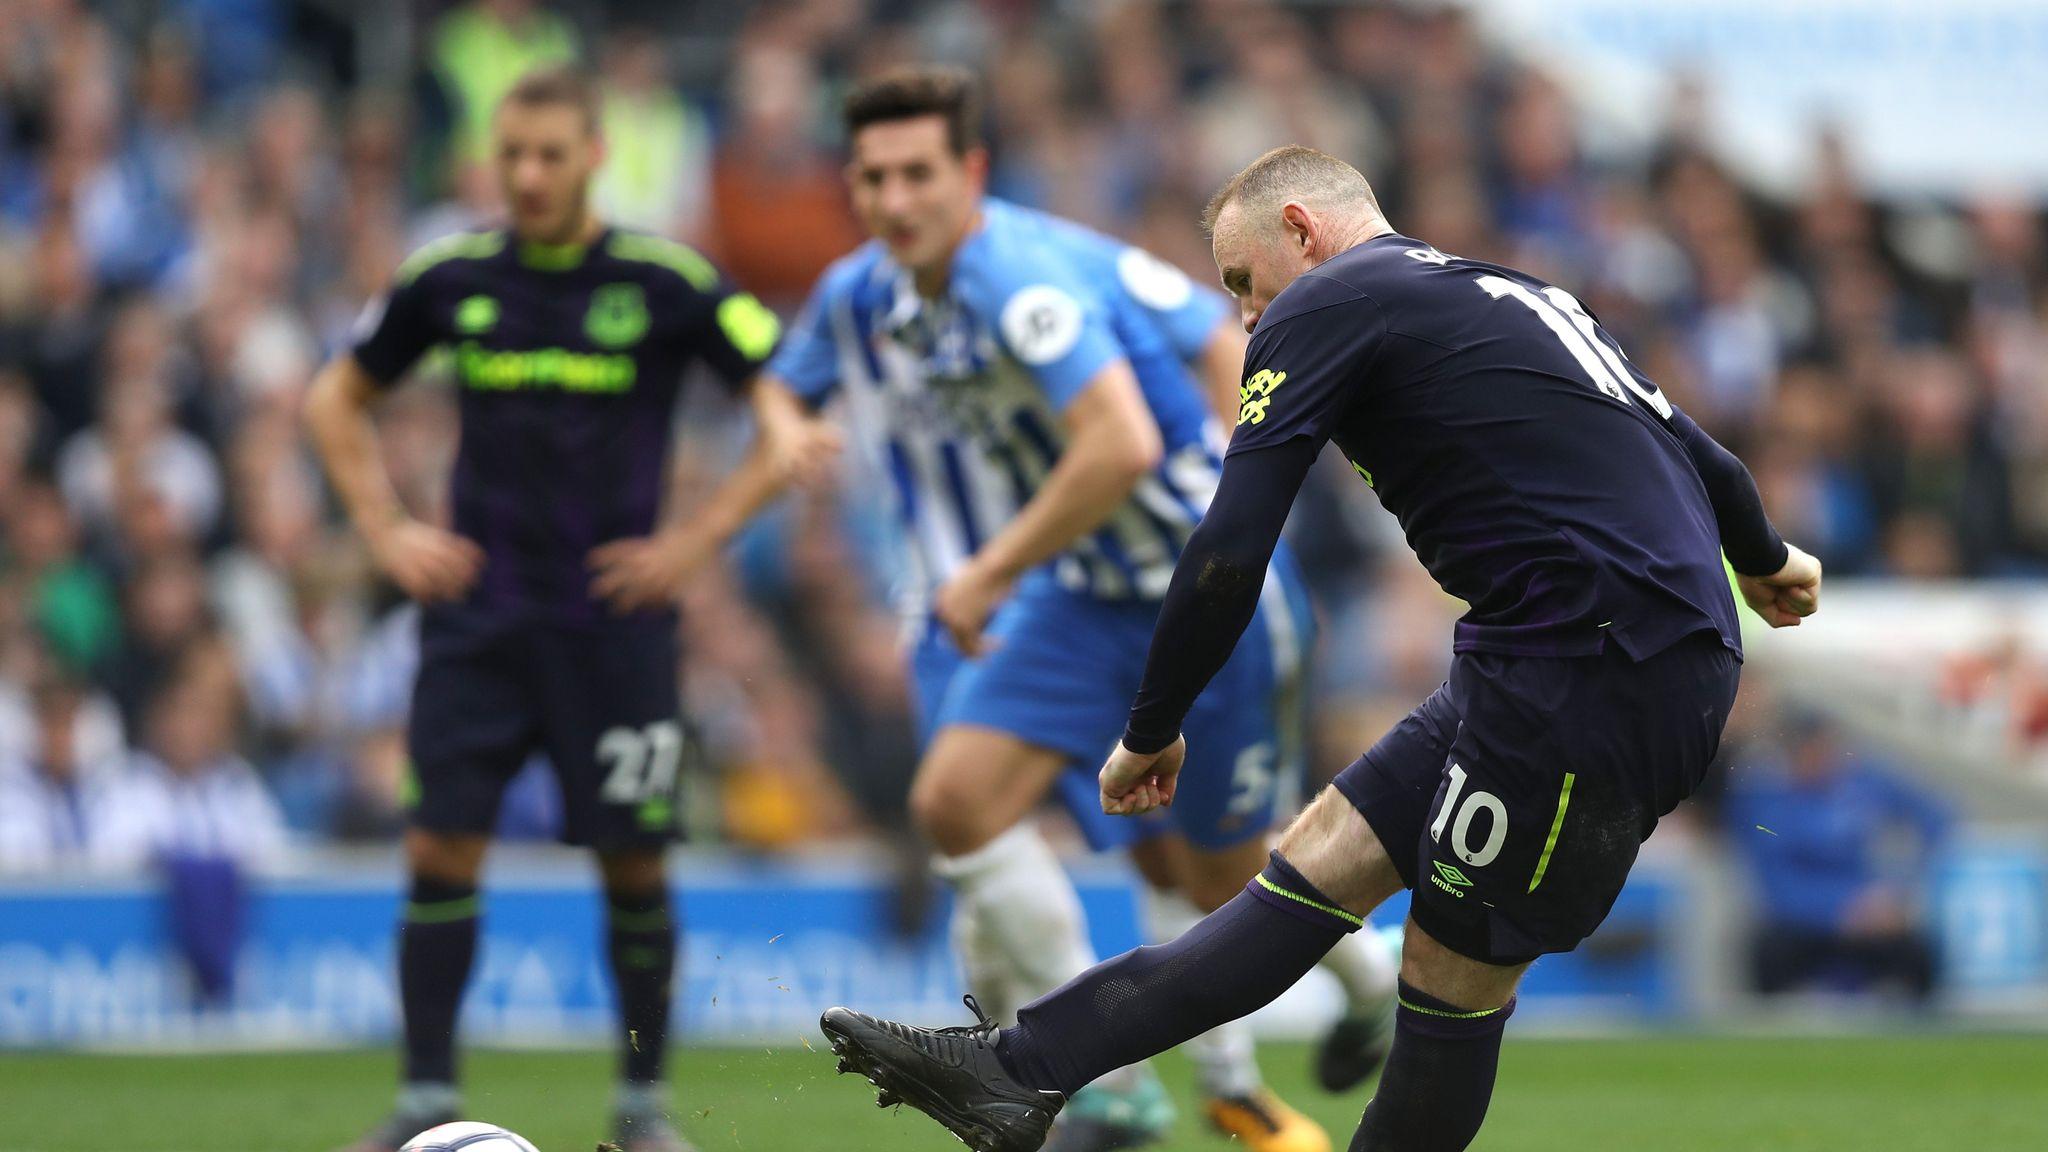 Brighton 1 1 Everton Match Report Highlights